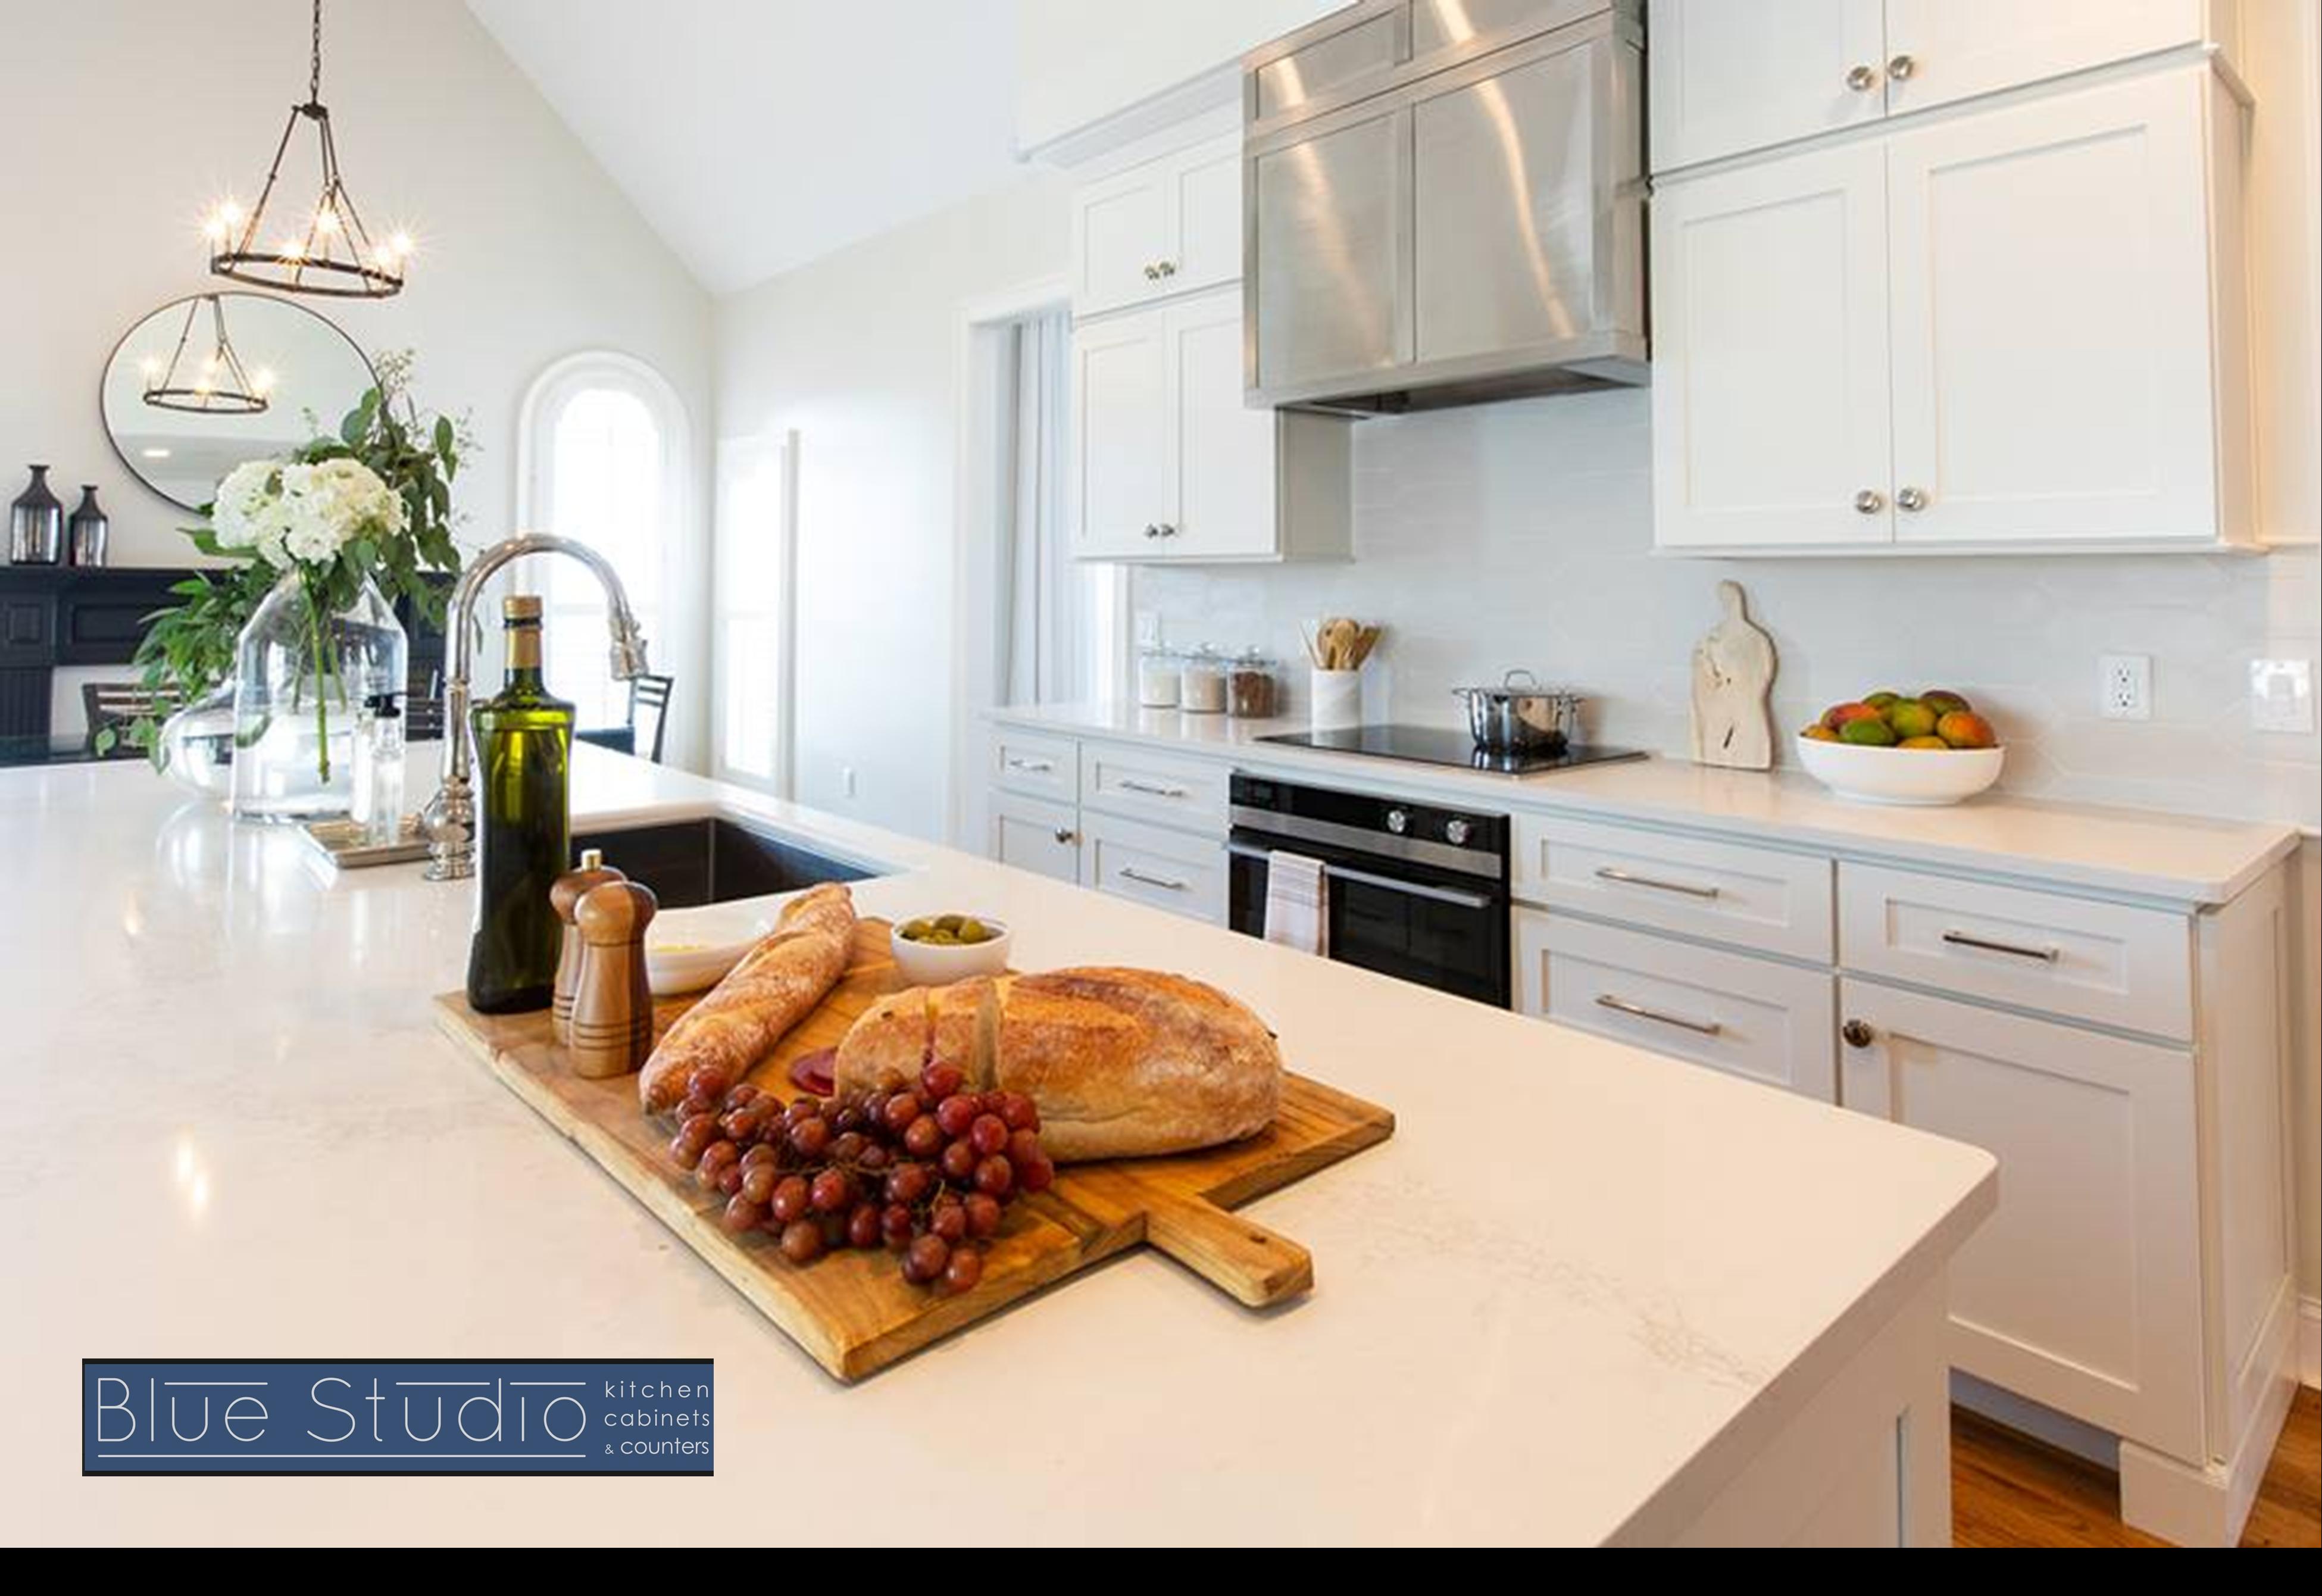 Check Us Out On Facebook Kitchendesign White Countertops Kuchendesign Kuchenprodukte Arbeitsflachen